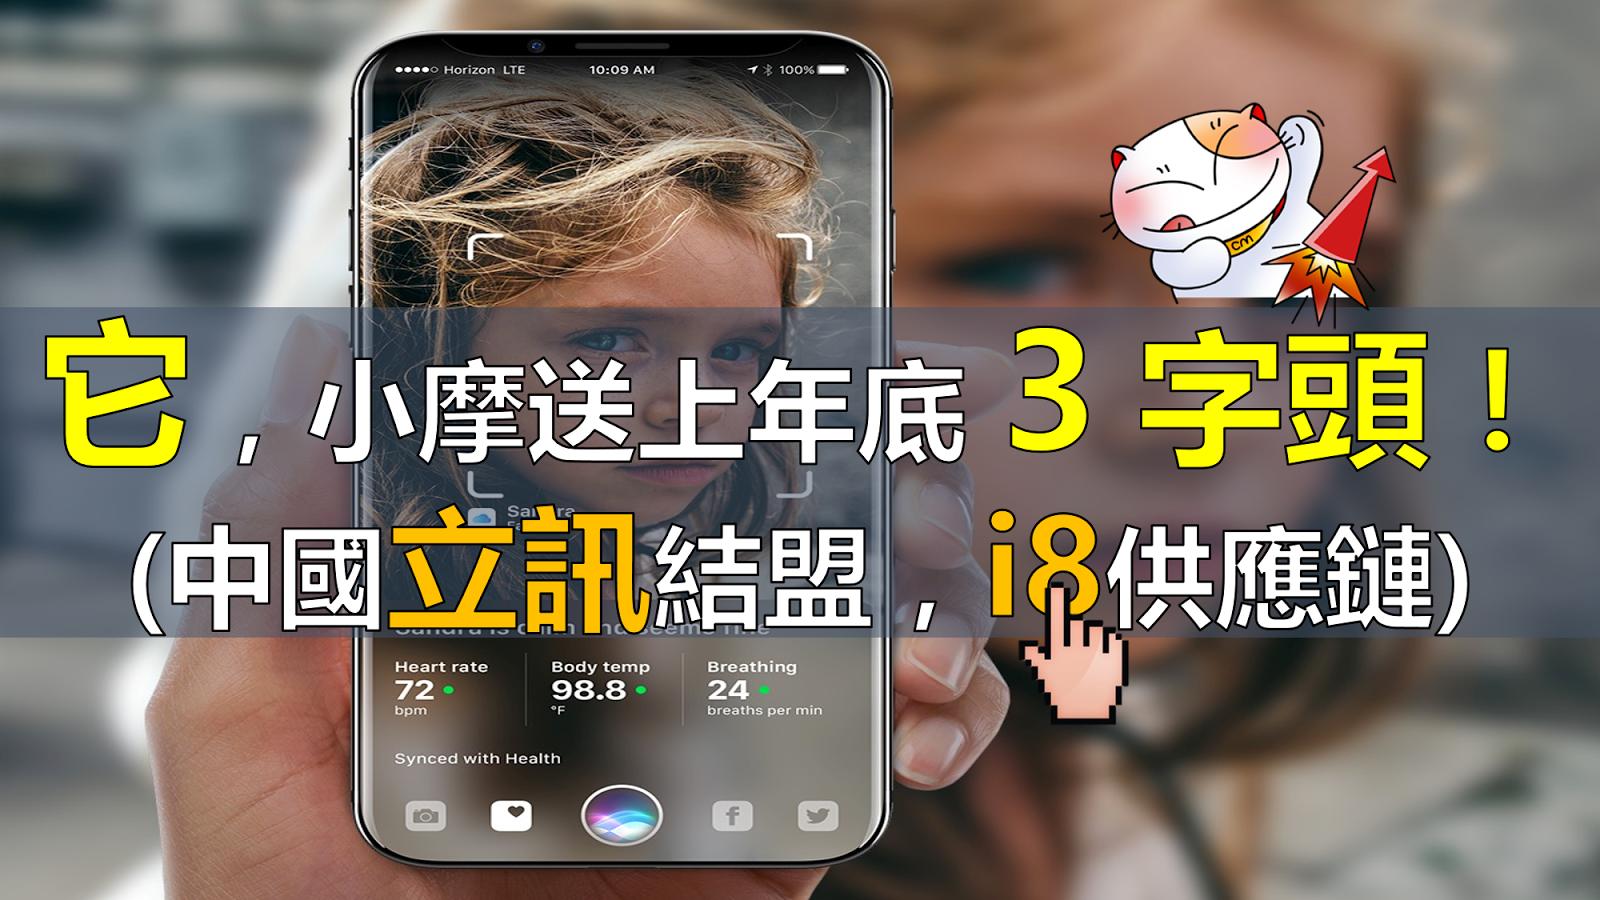 iPhone 8 上市倒數…『這檔』與中國立訊結盟,外資送暖 年底目標「3」字頭!